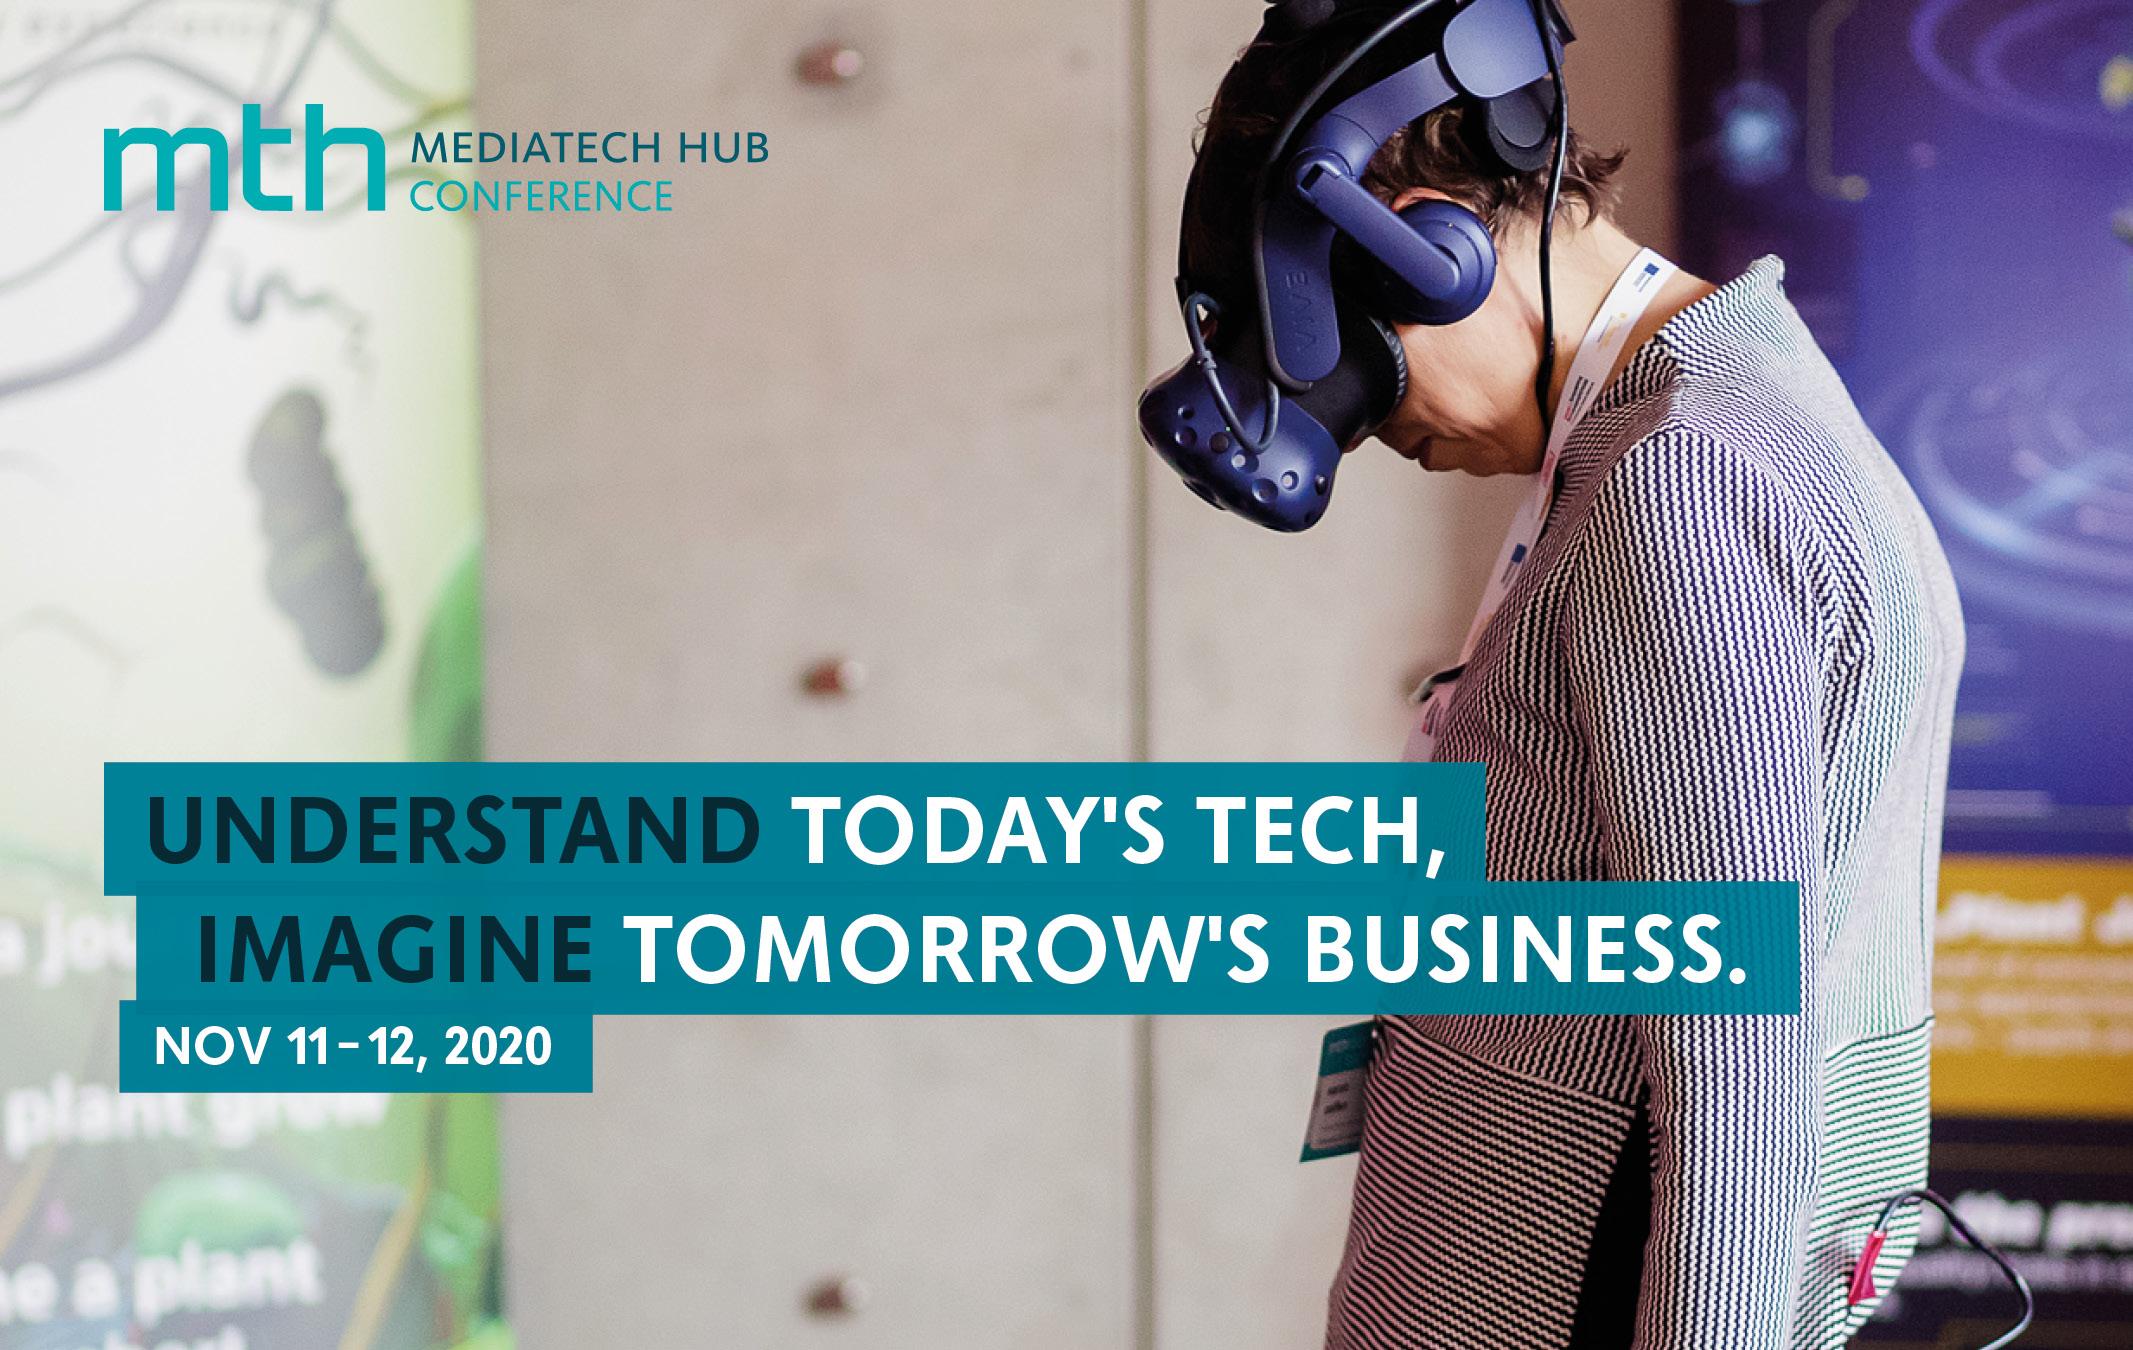 MediaTech Hub Conference 2020